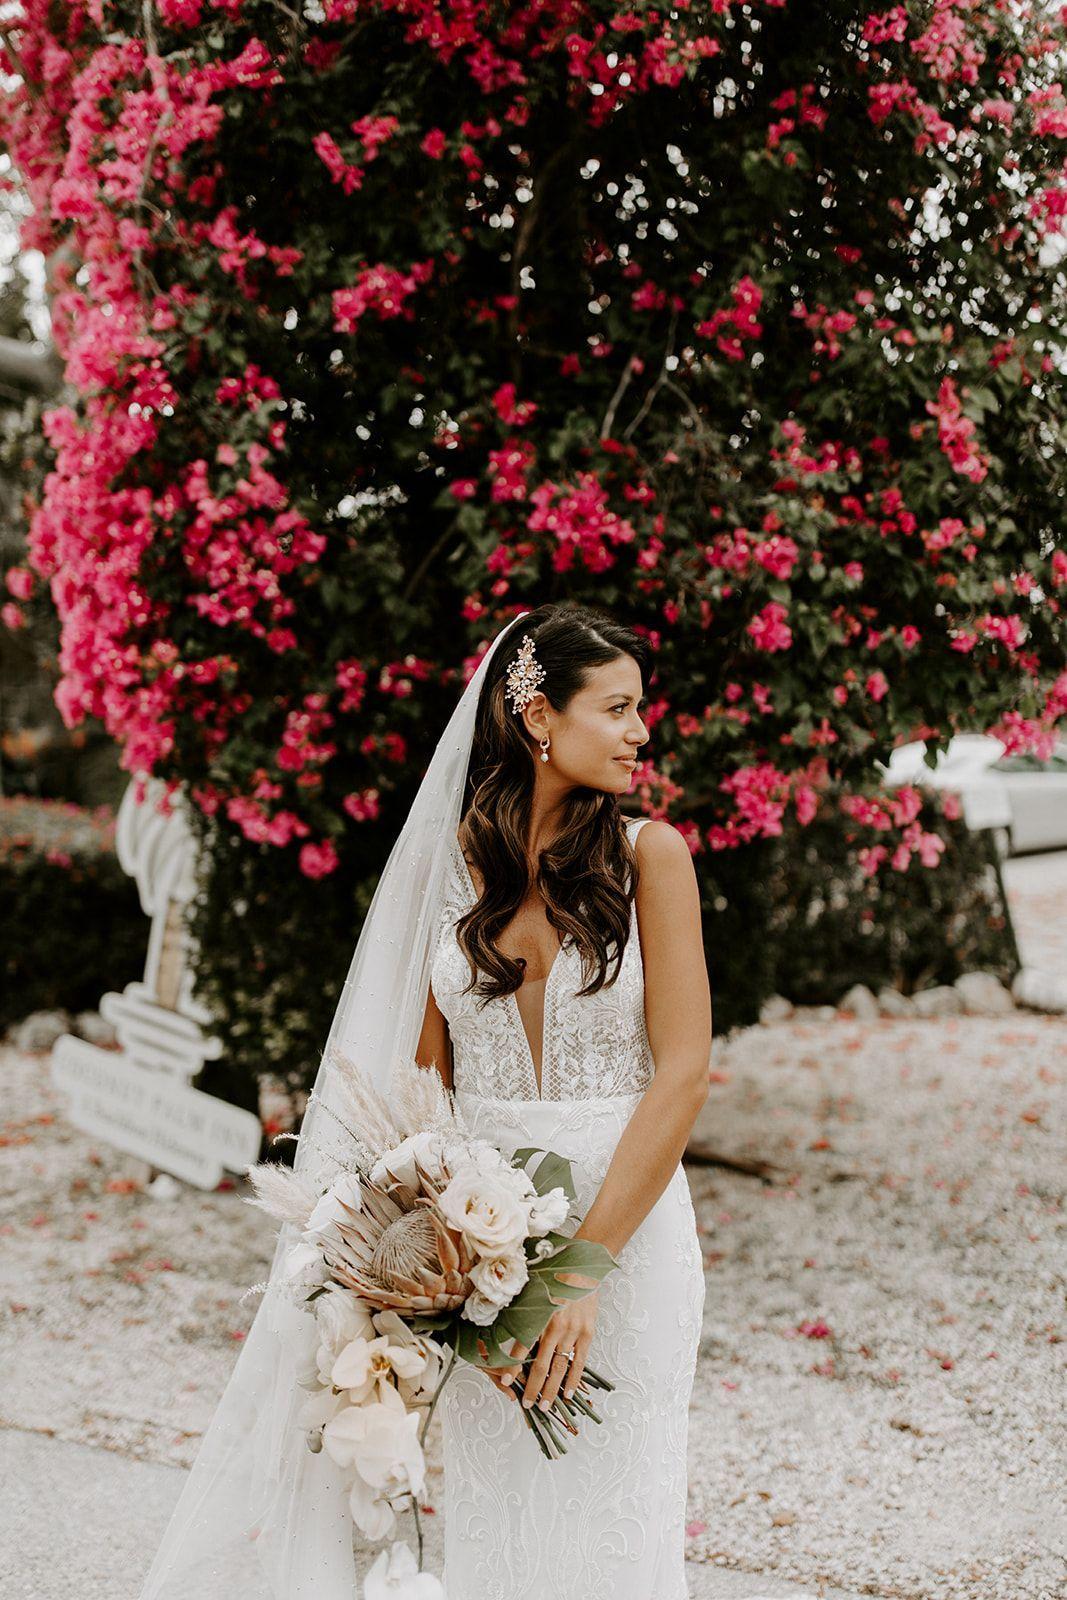 Contact A Planner Blue Water Weddings Florida Keys Wedding Planning Hollywood Wedding Hair Bride Hairstyles With Veil Bride Hair Down